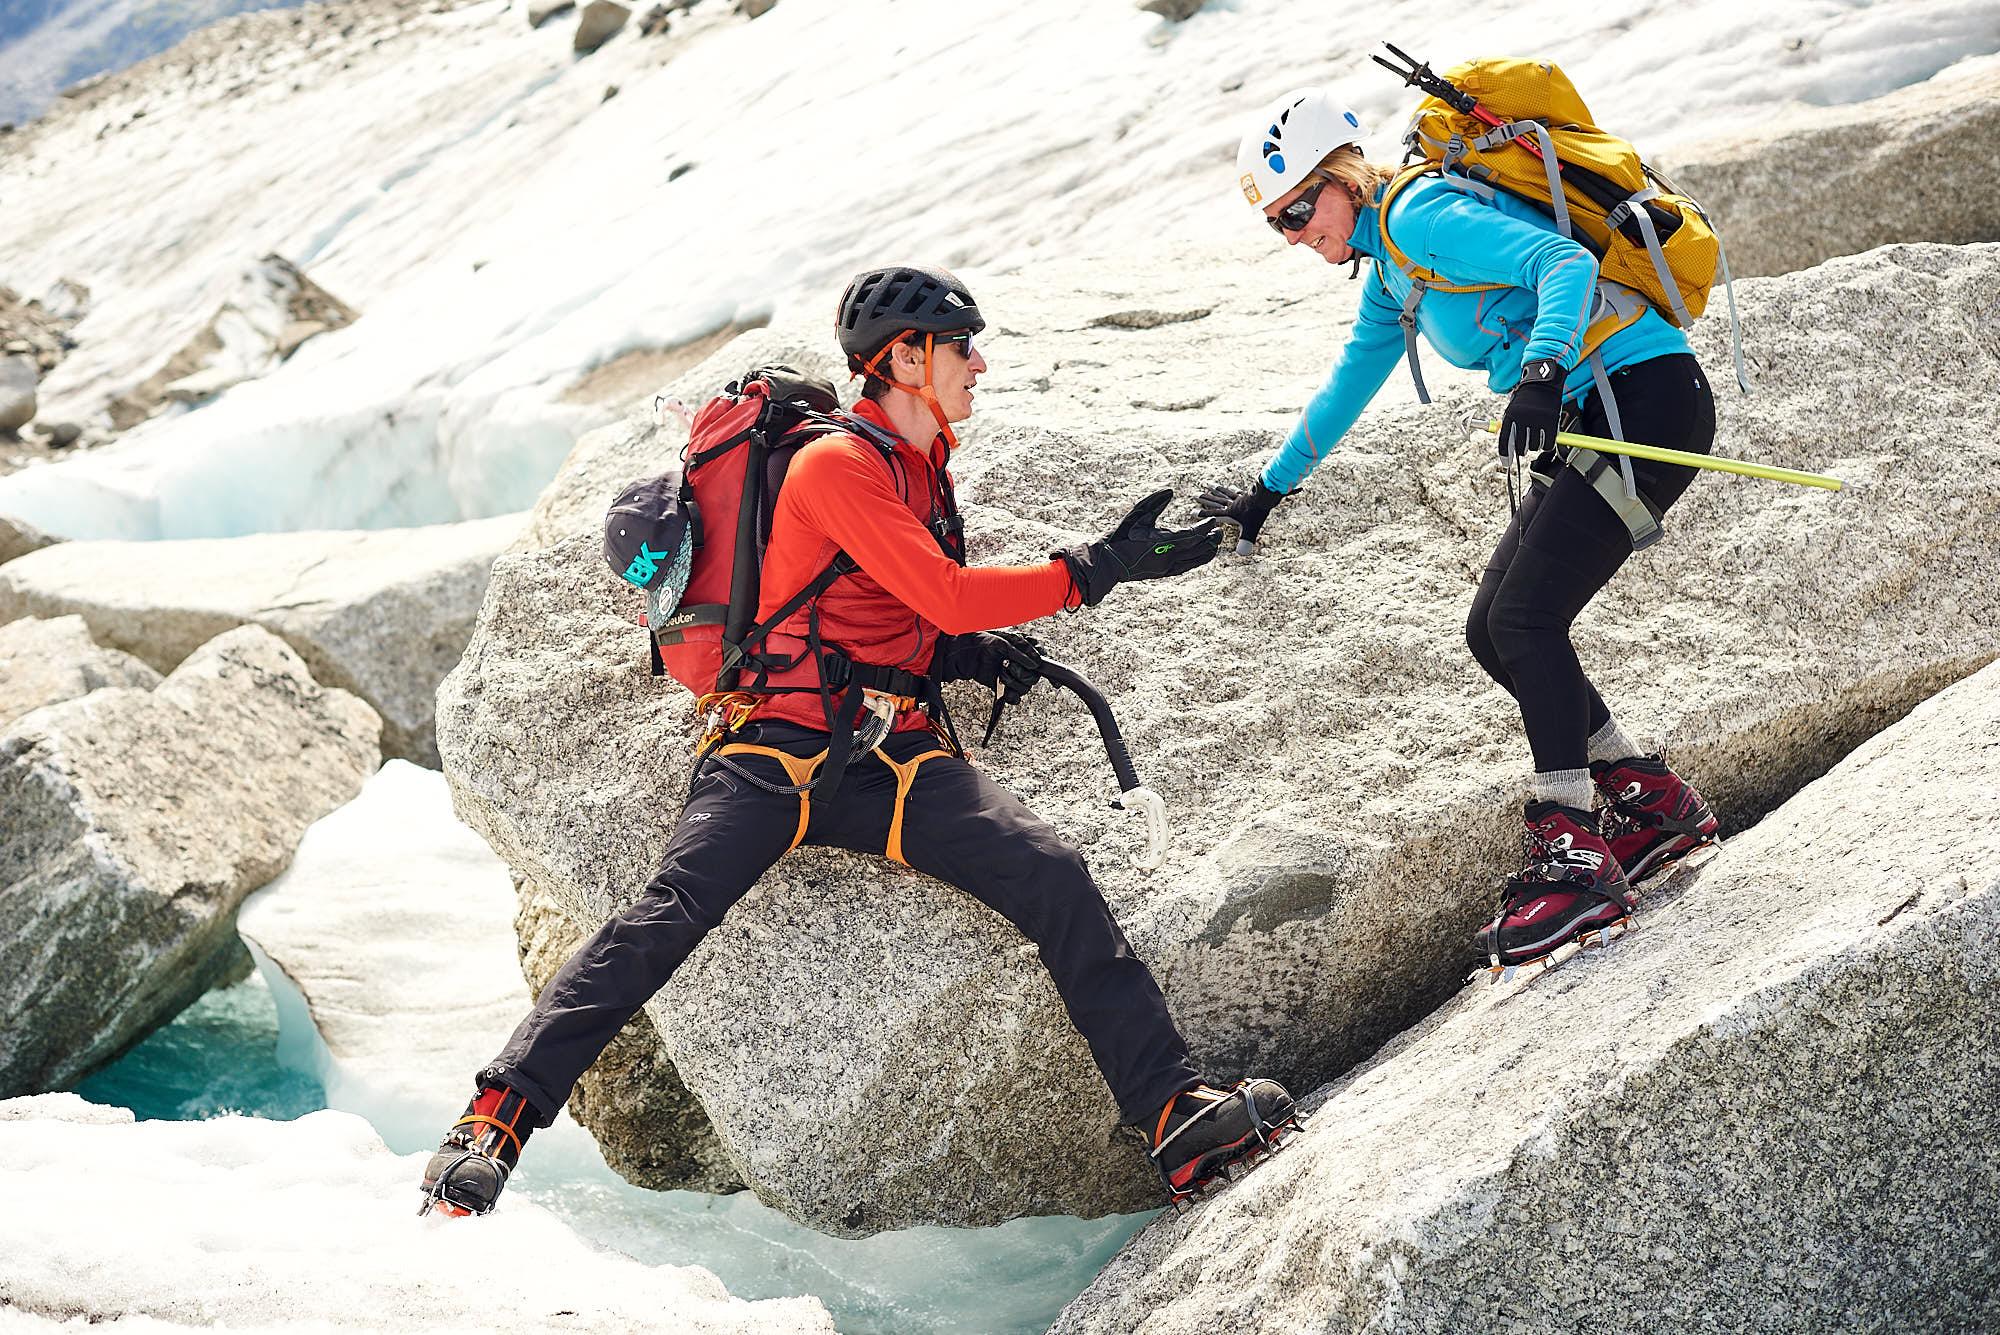 Mountain guide helping a client across a glacial stream on the Mer de Glace glacier